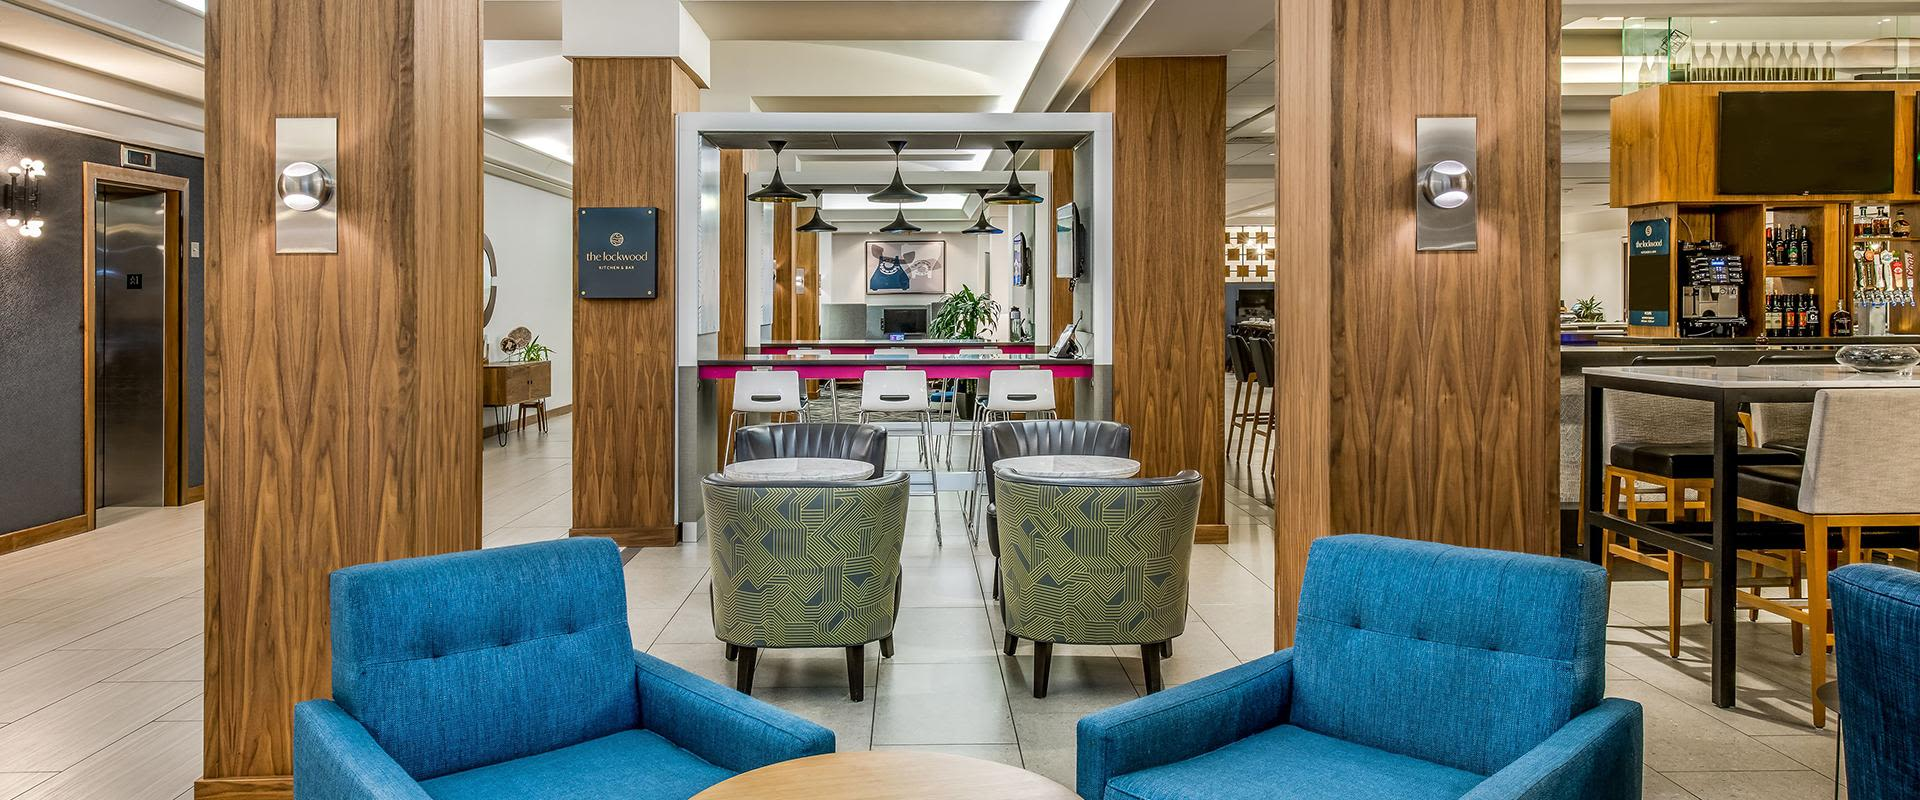 Denver Lounge And Work Area Near Bar